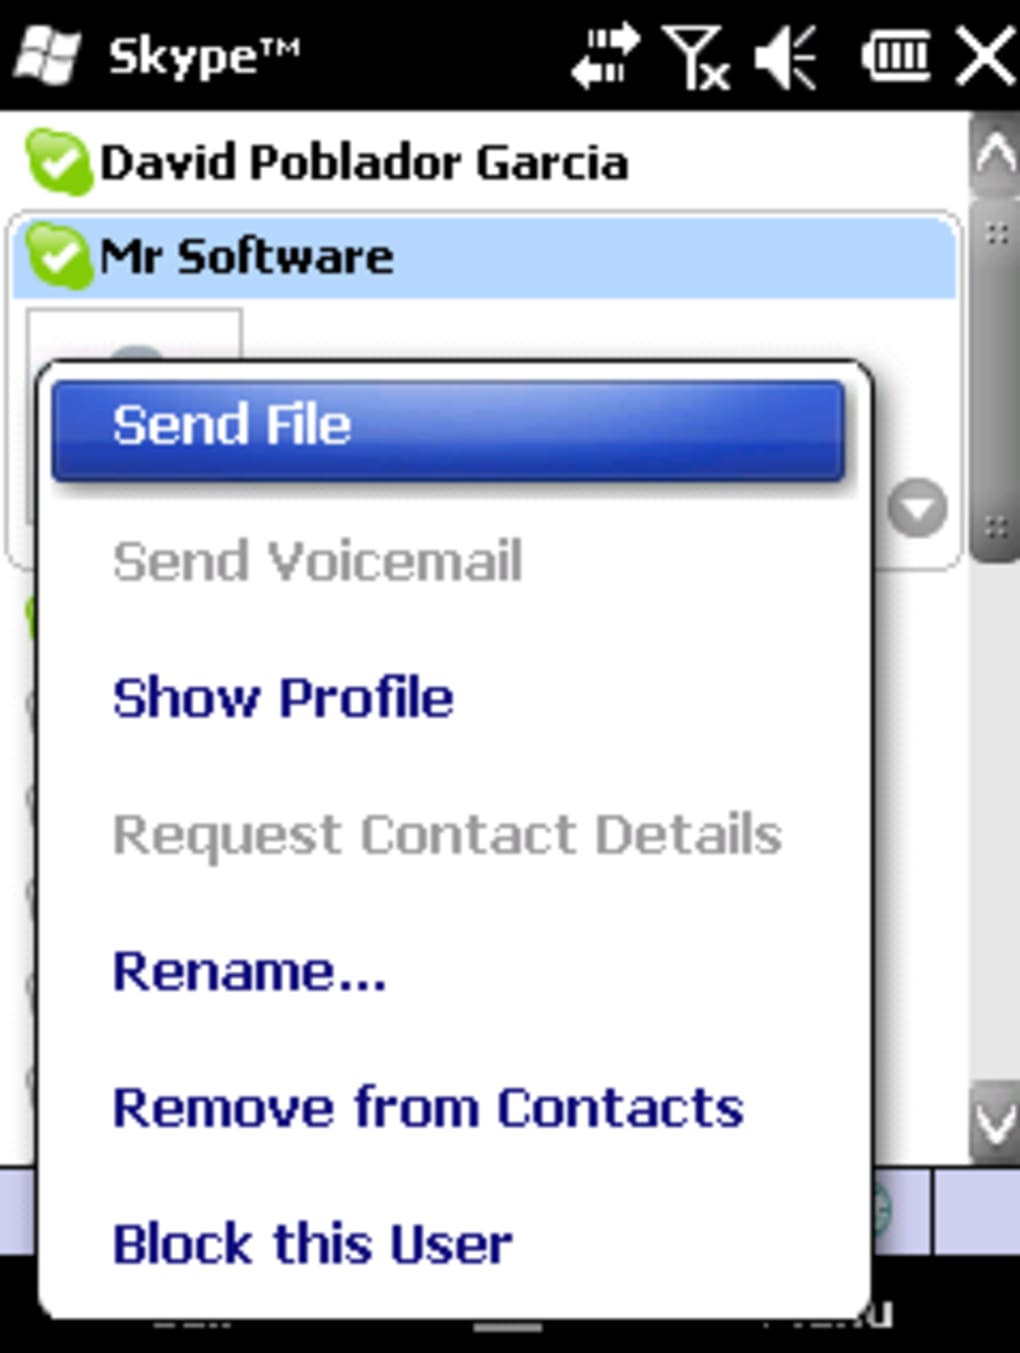 skype pour pocket pc 3.0.0.256